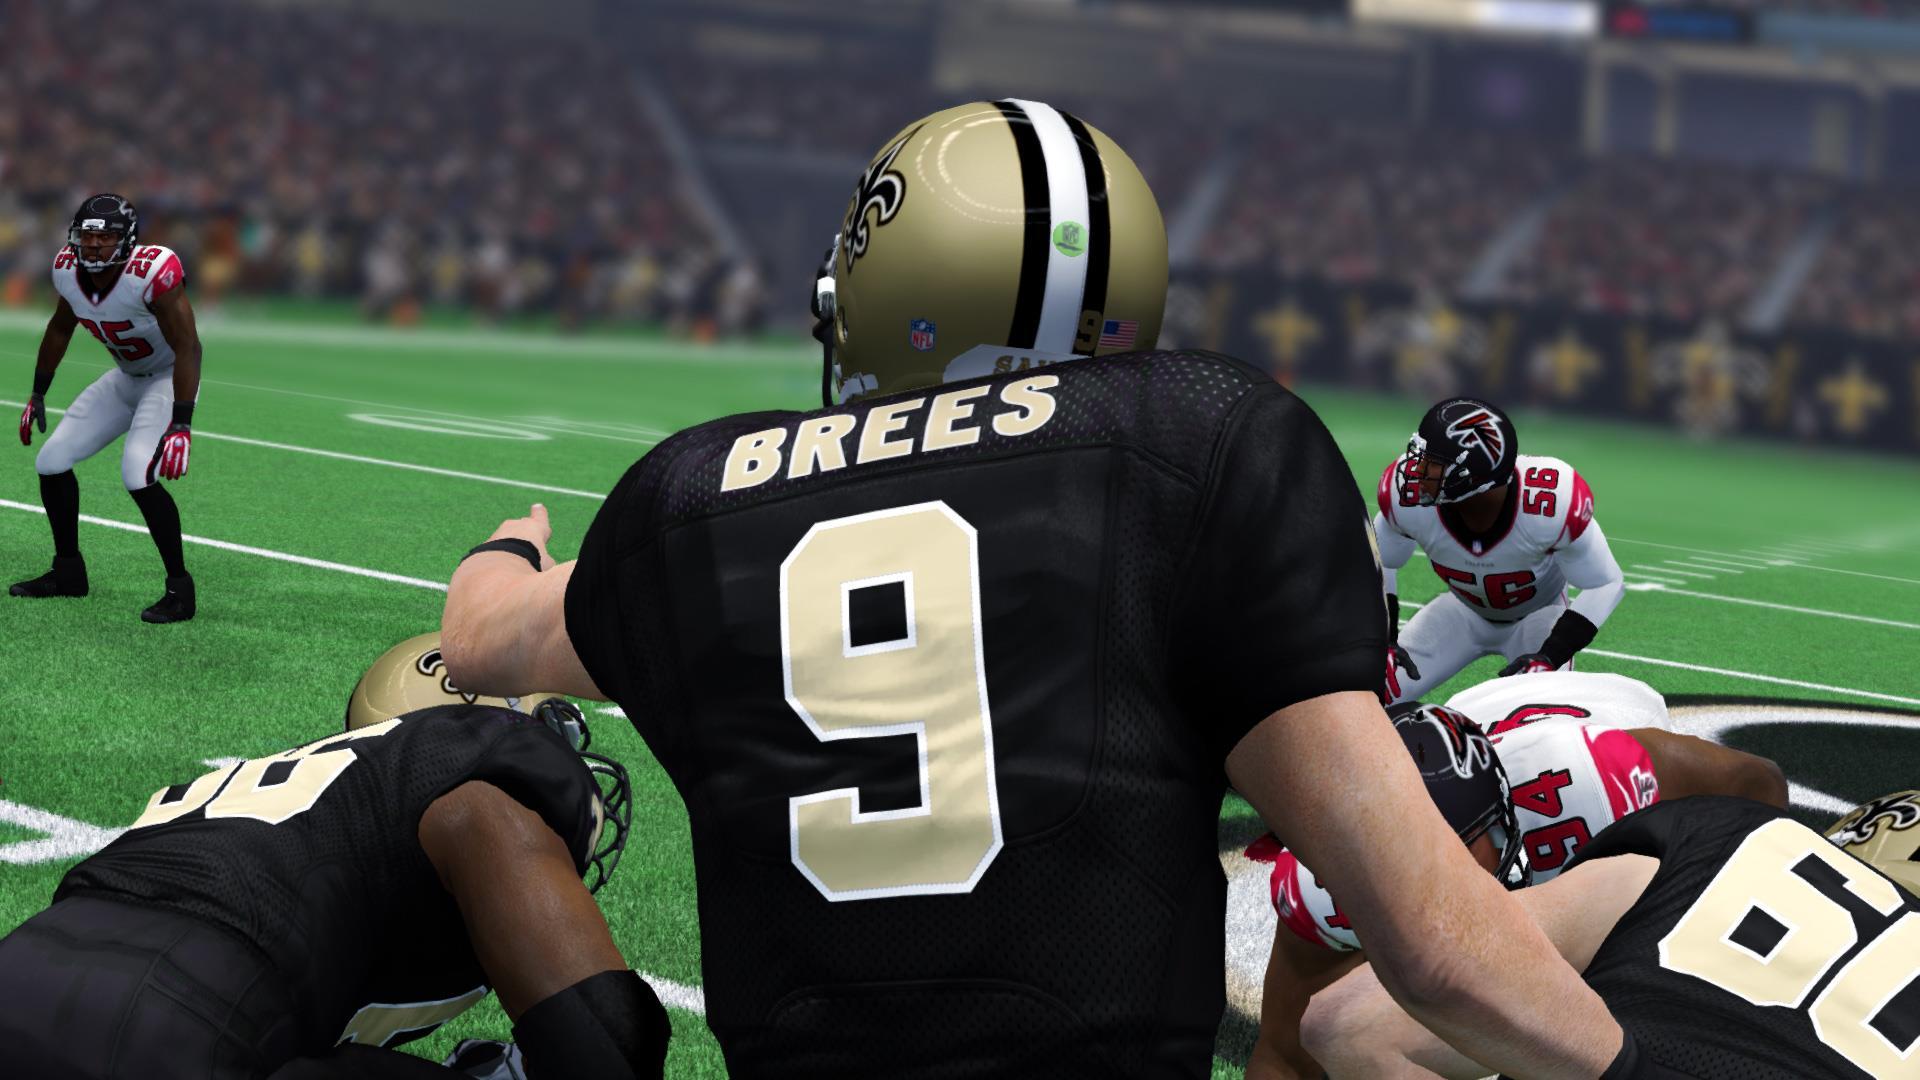 Drew Brees Legacy Award in Madden NFL 25 (Xbox One)